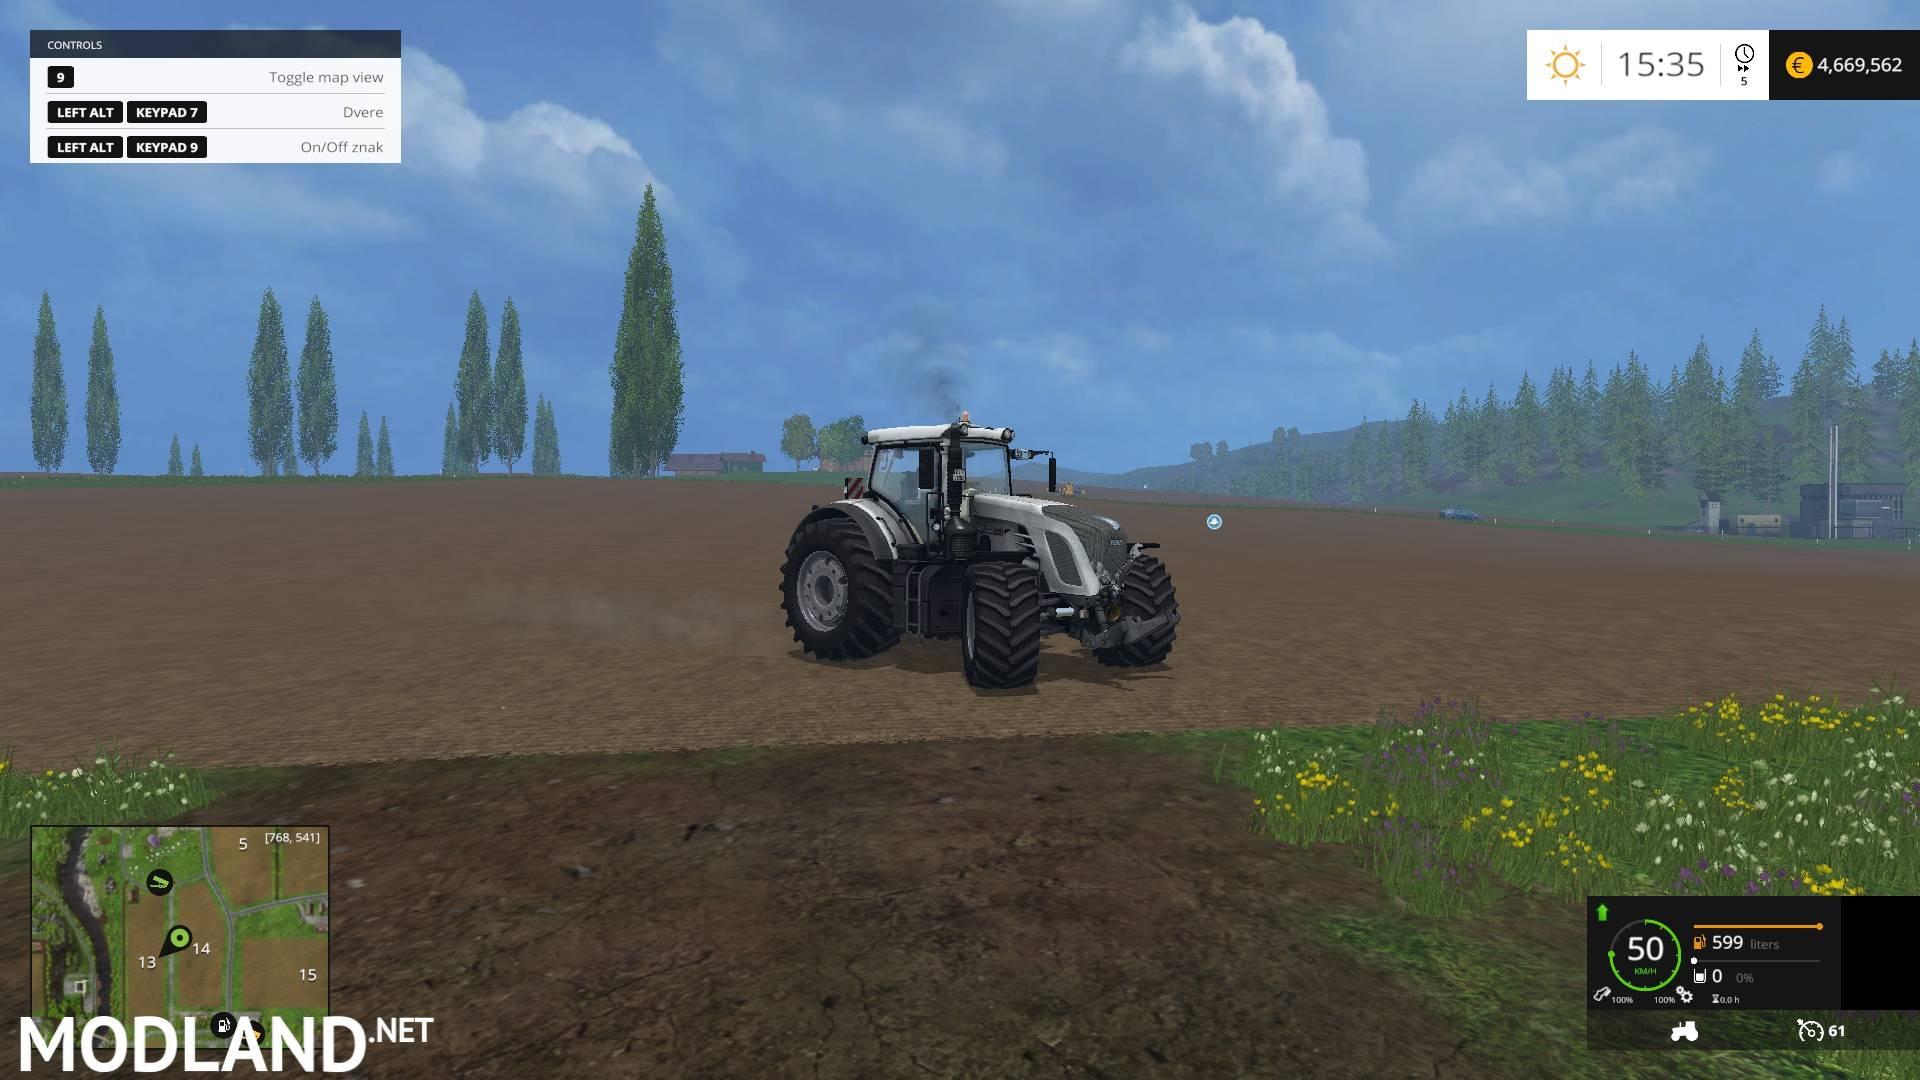 Fendt 933 Vario White Edition mod for Farming Simulator 2015 / 15